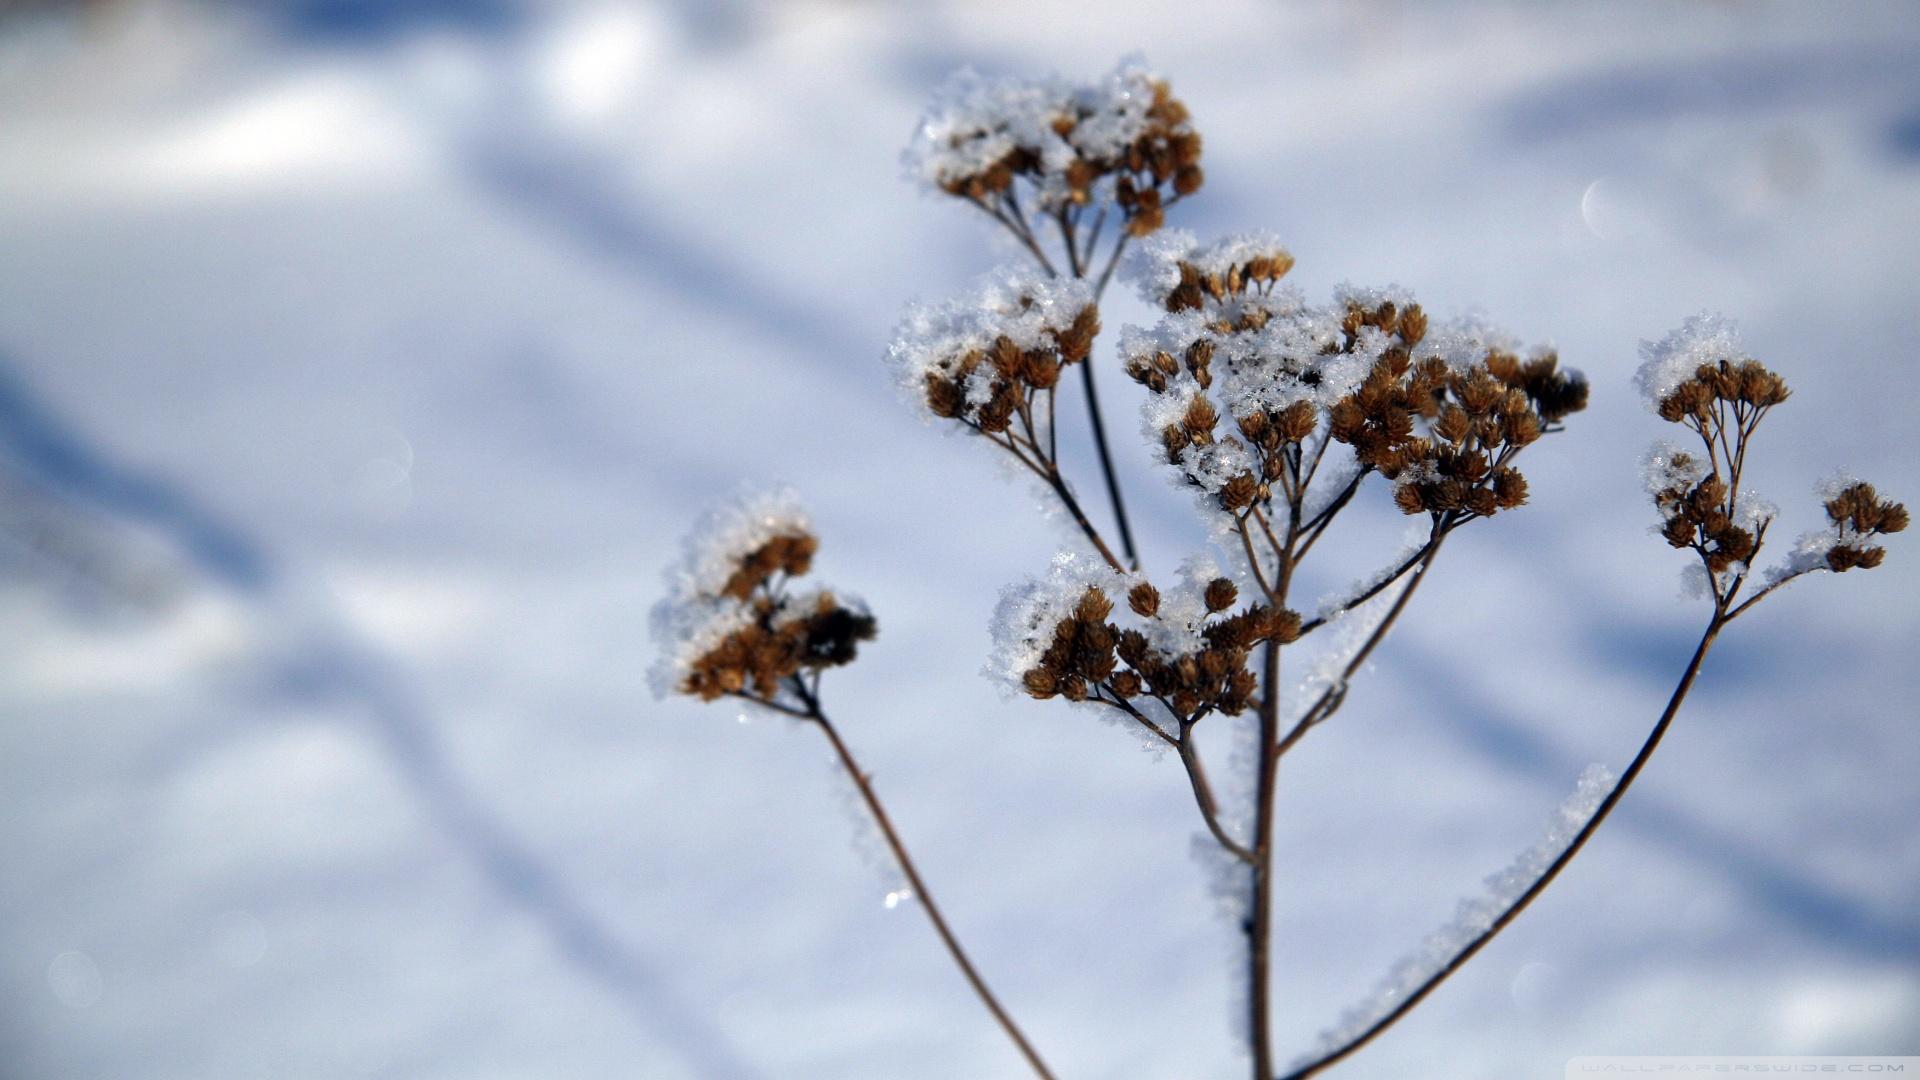 Plant in winter photo